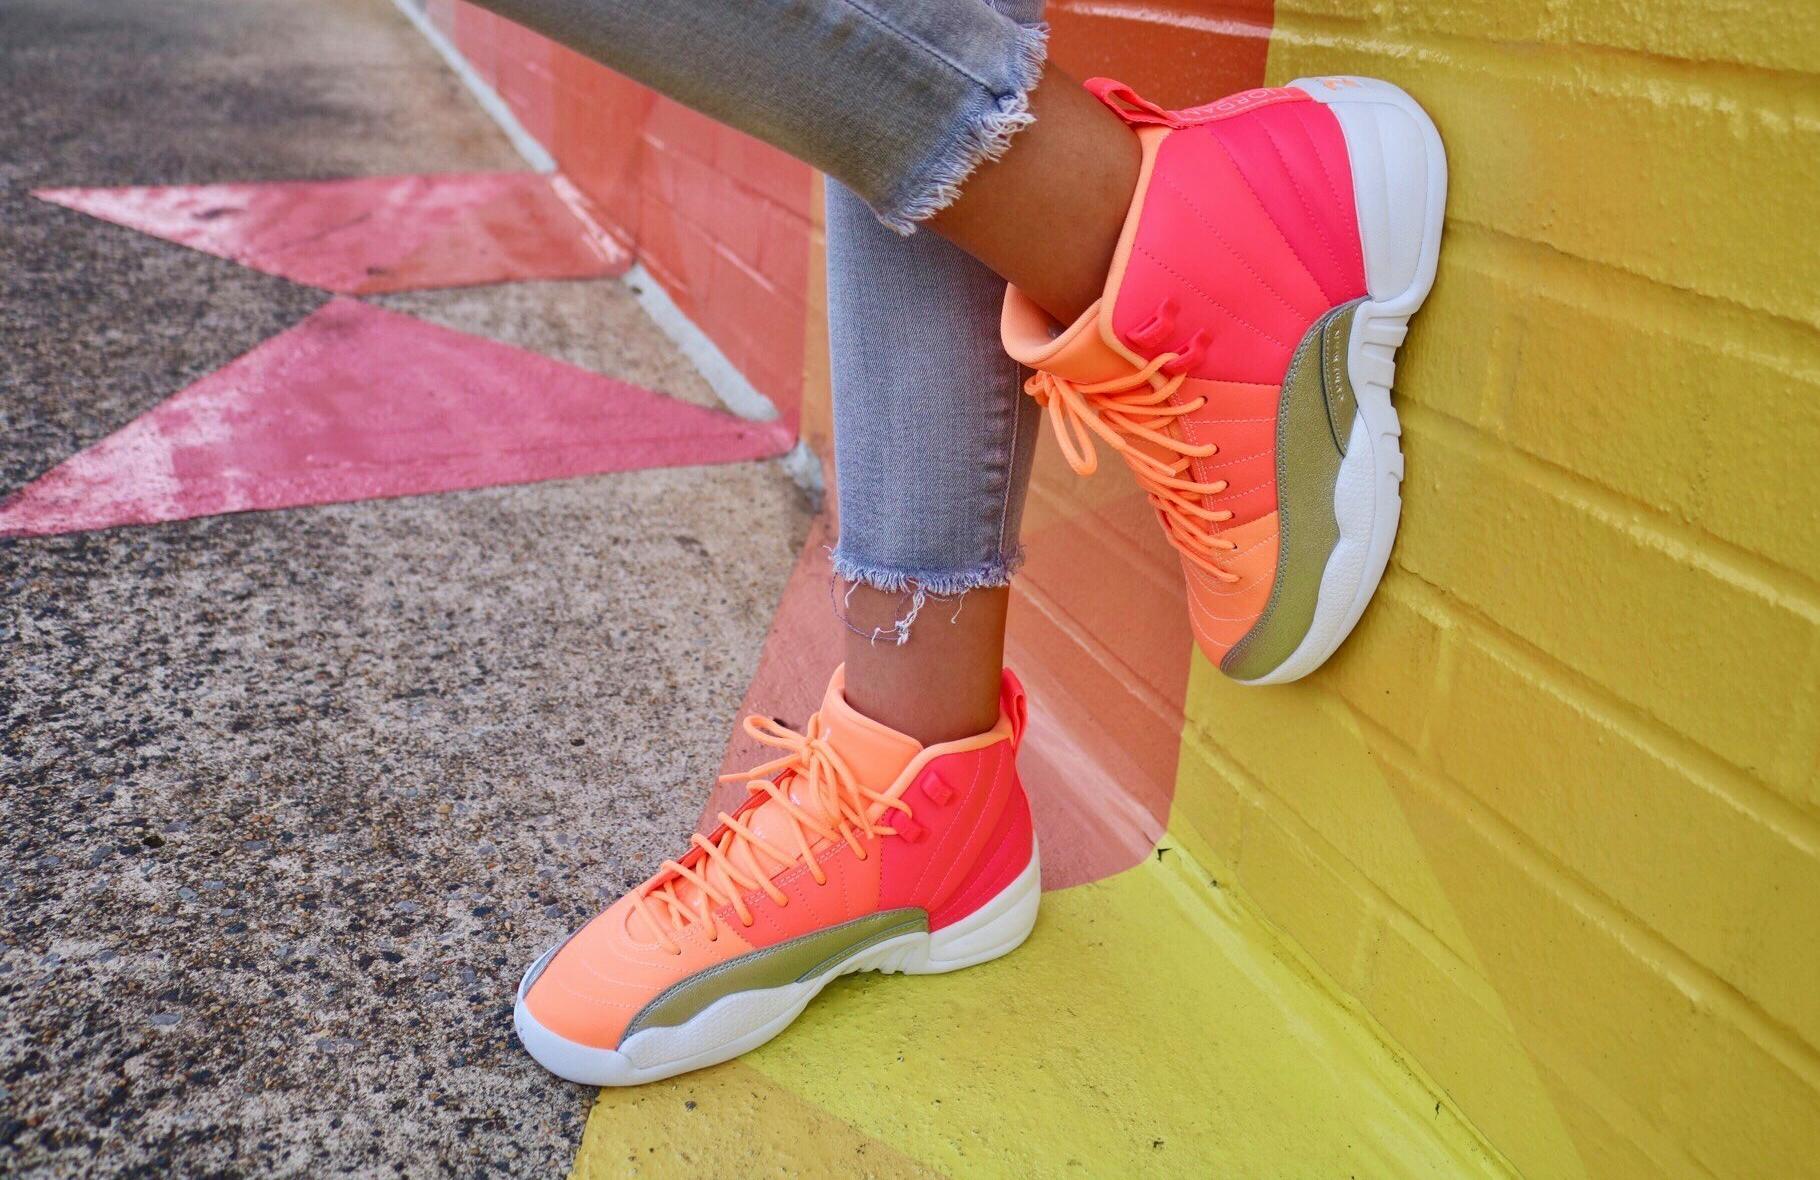 Sneakers Release Jordan Retro 12 Racer Pink White Hot Punch